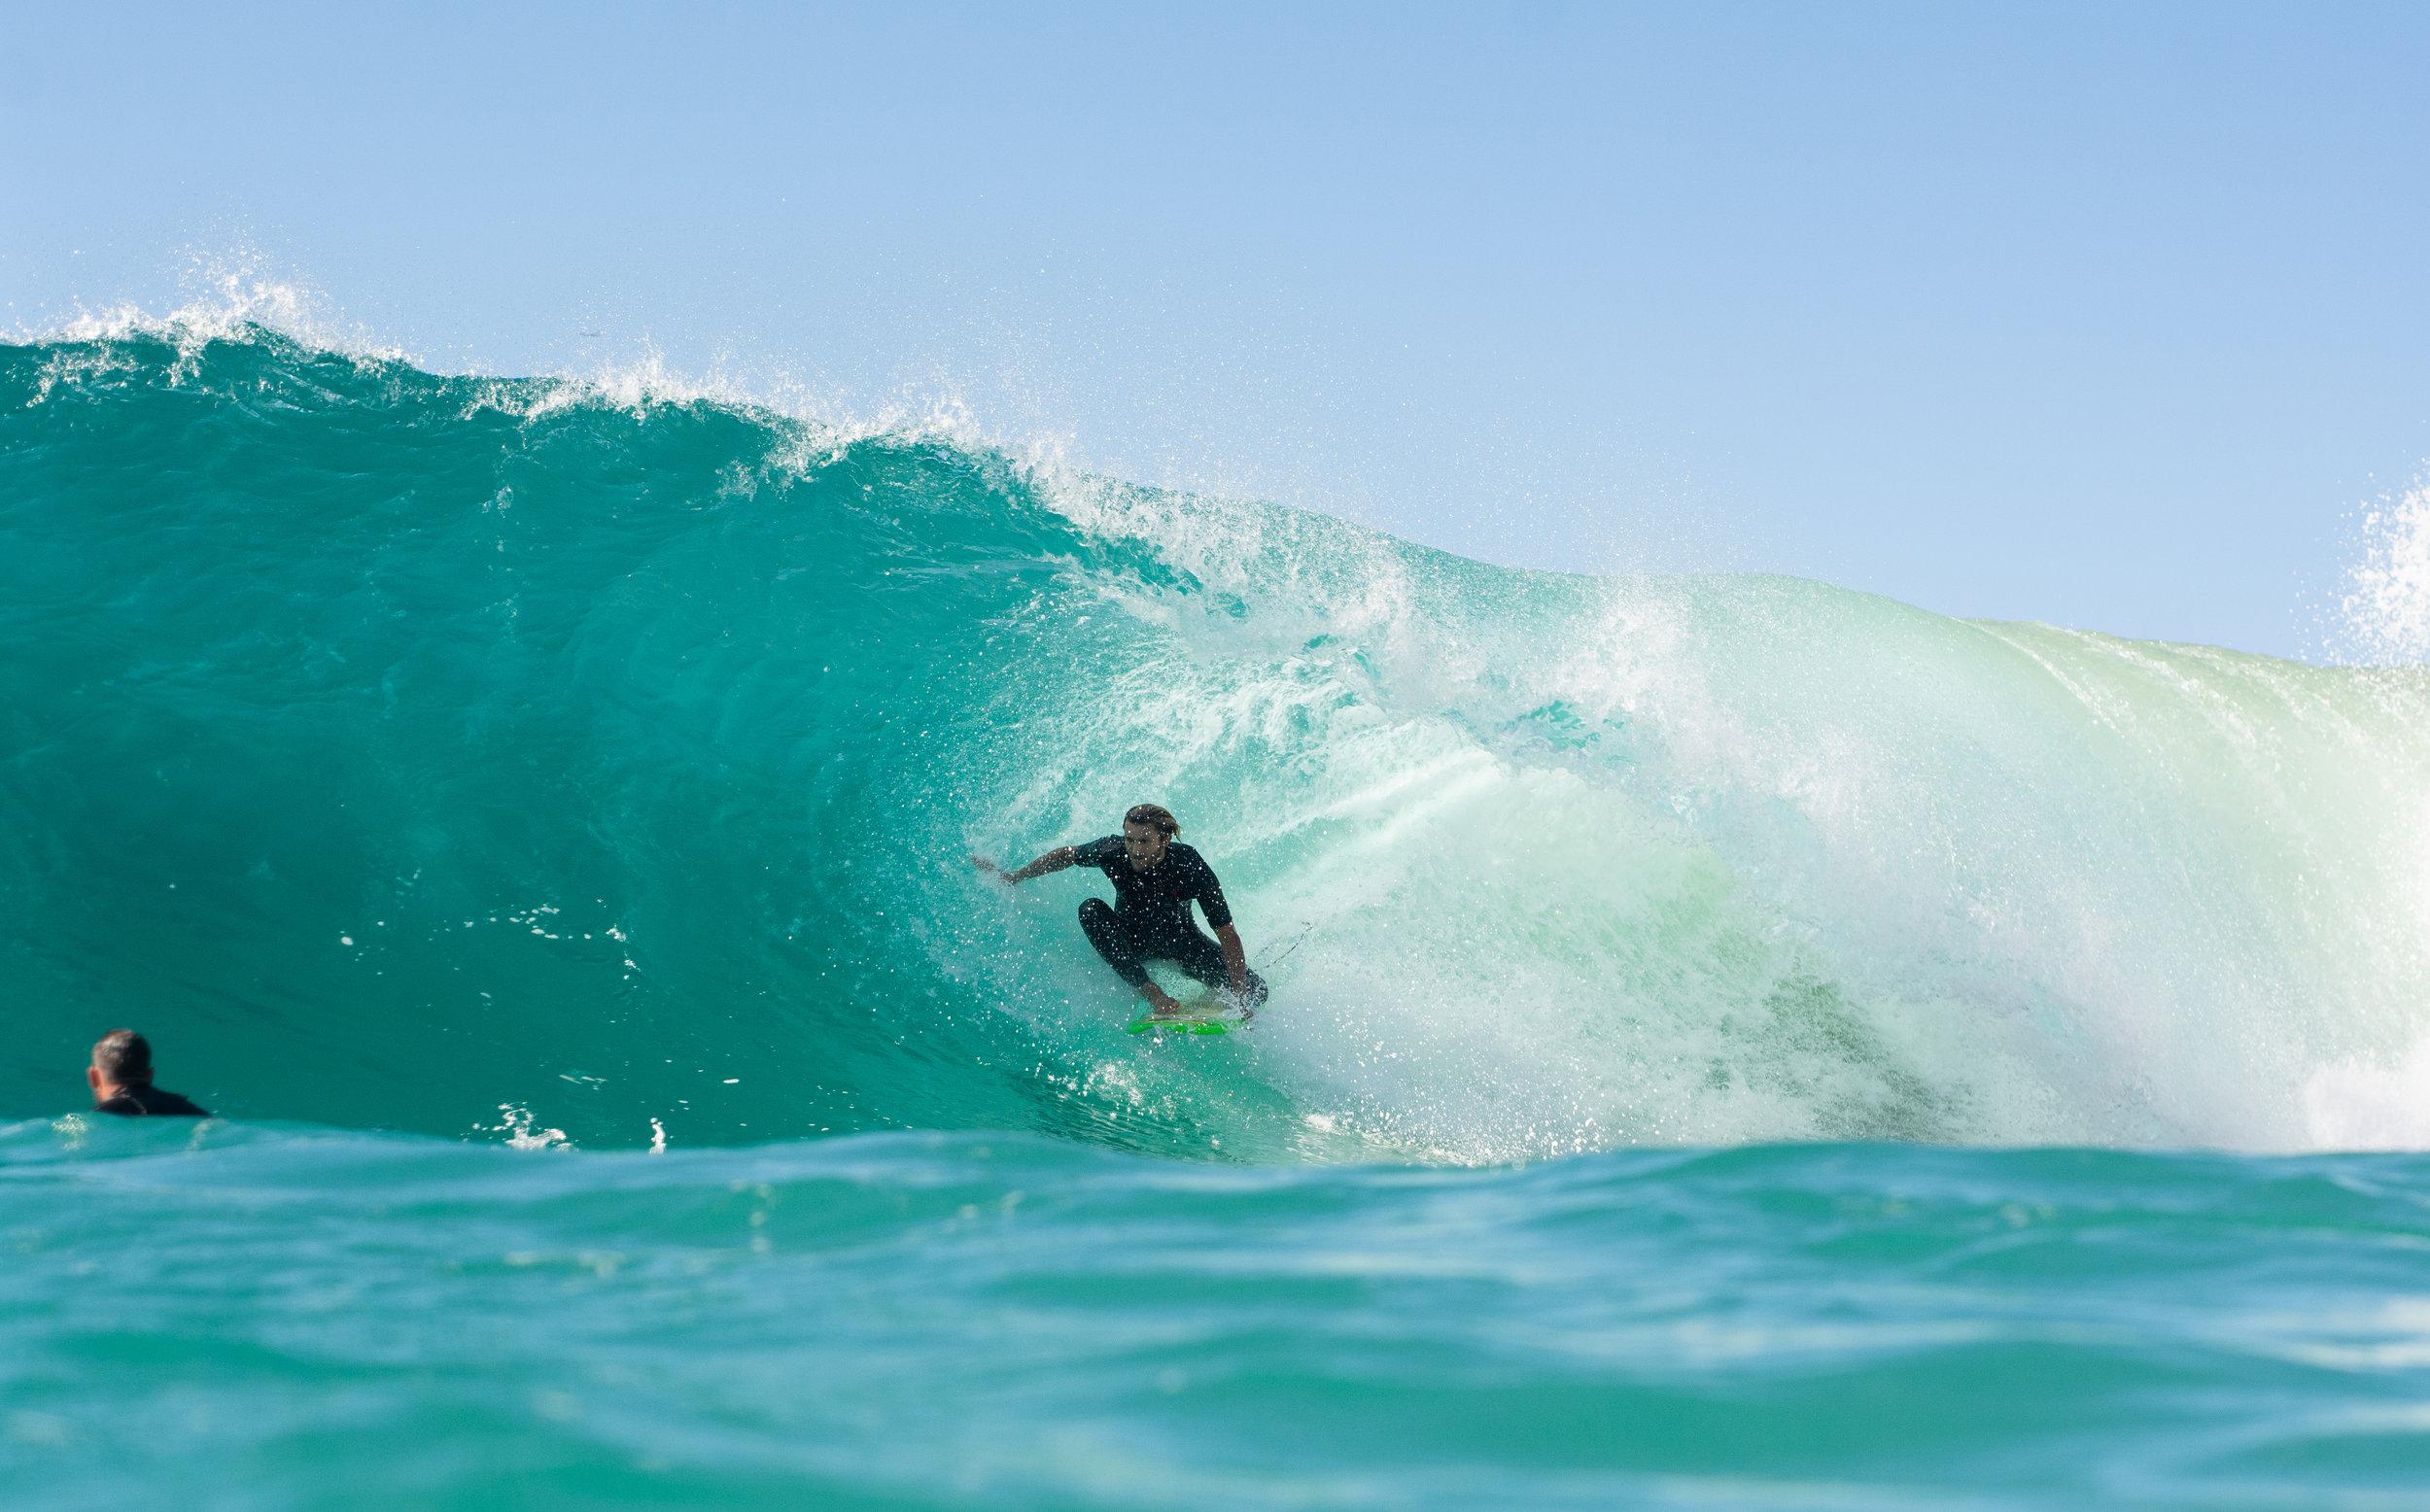 snapper_rocks_australia_saltwater_7